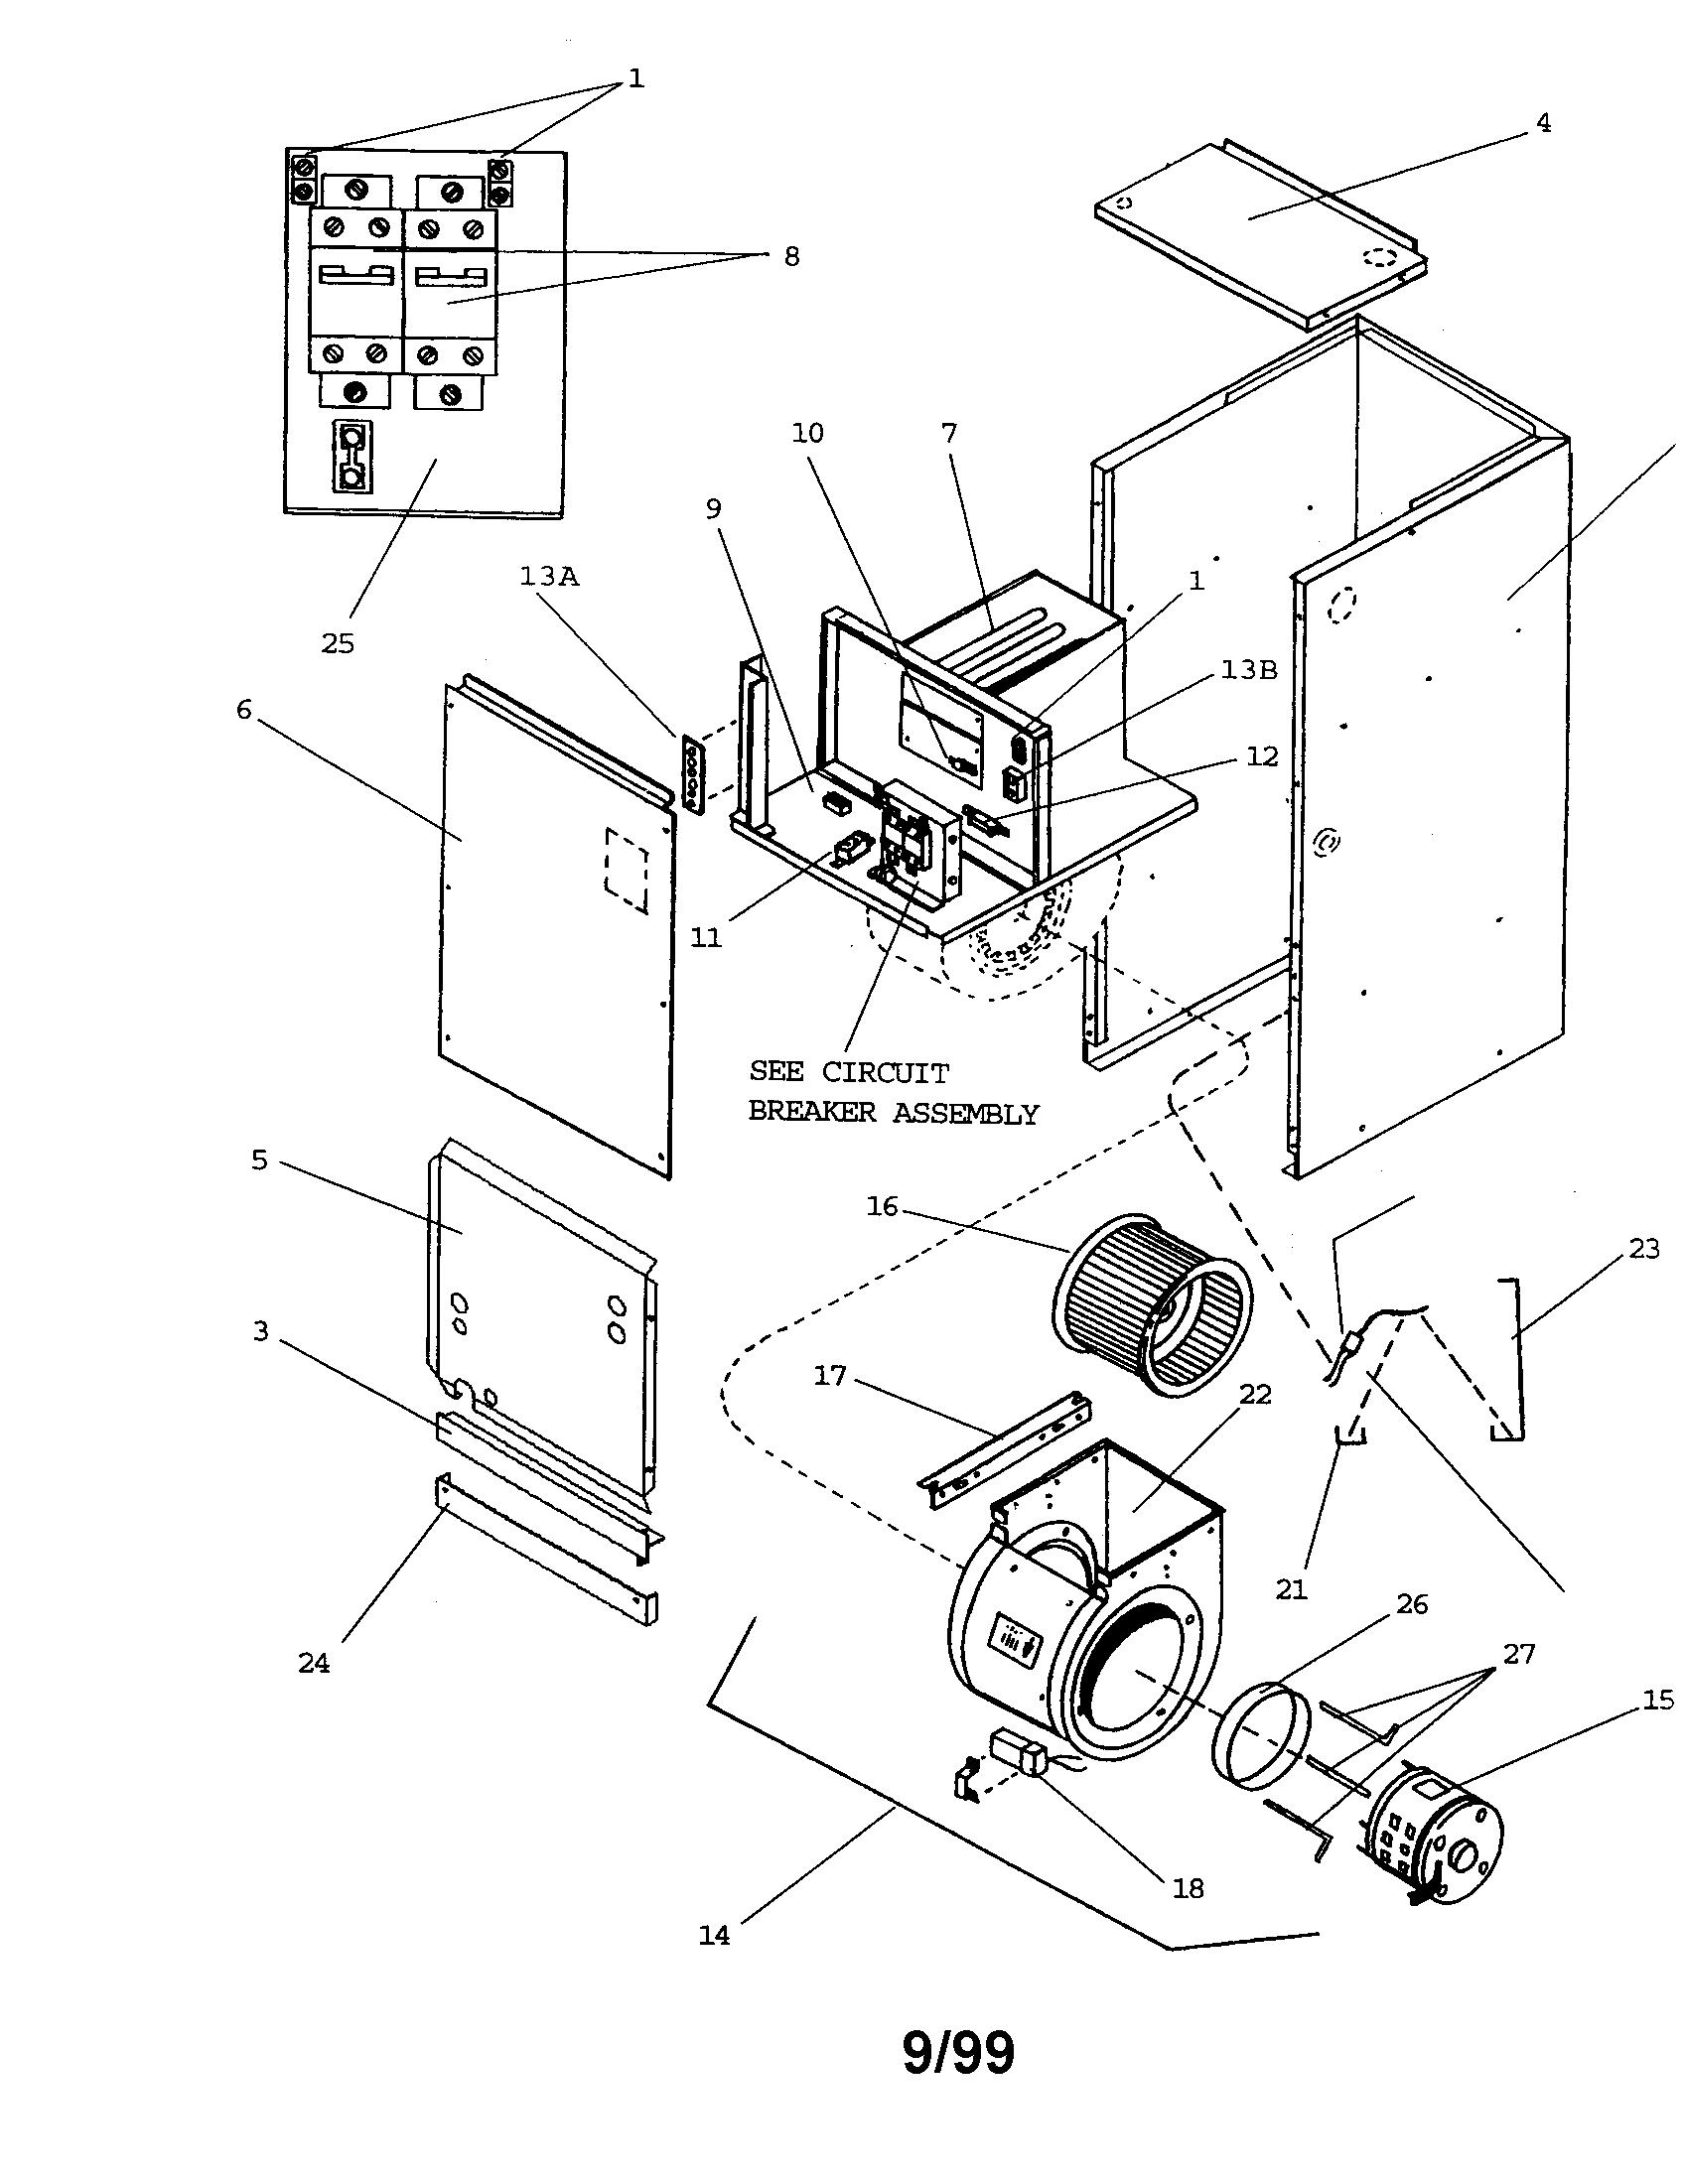 Goodman model a49 15 air handler indoor blower evap genuine parts rh searspartsdirect goodman air conditioner parts diagram goodman air conditioner